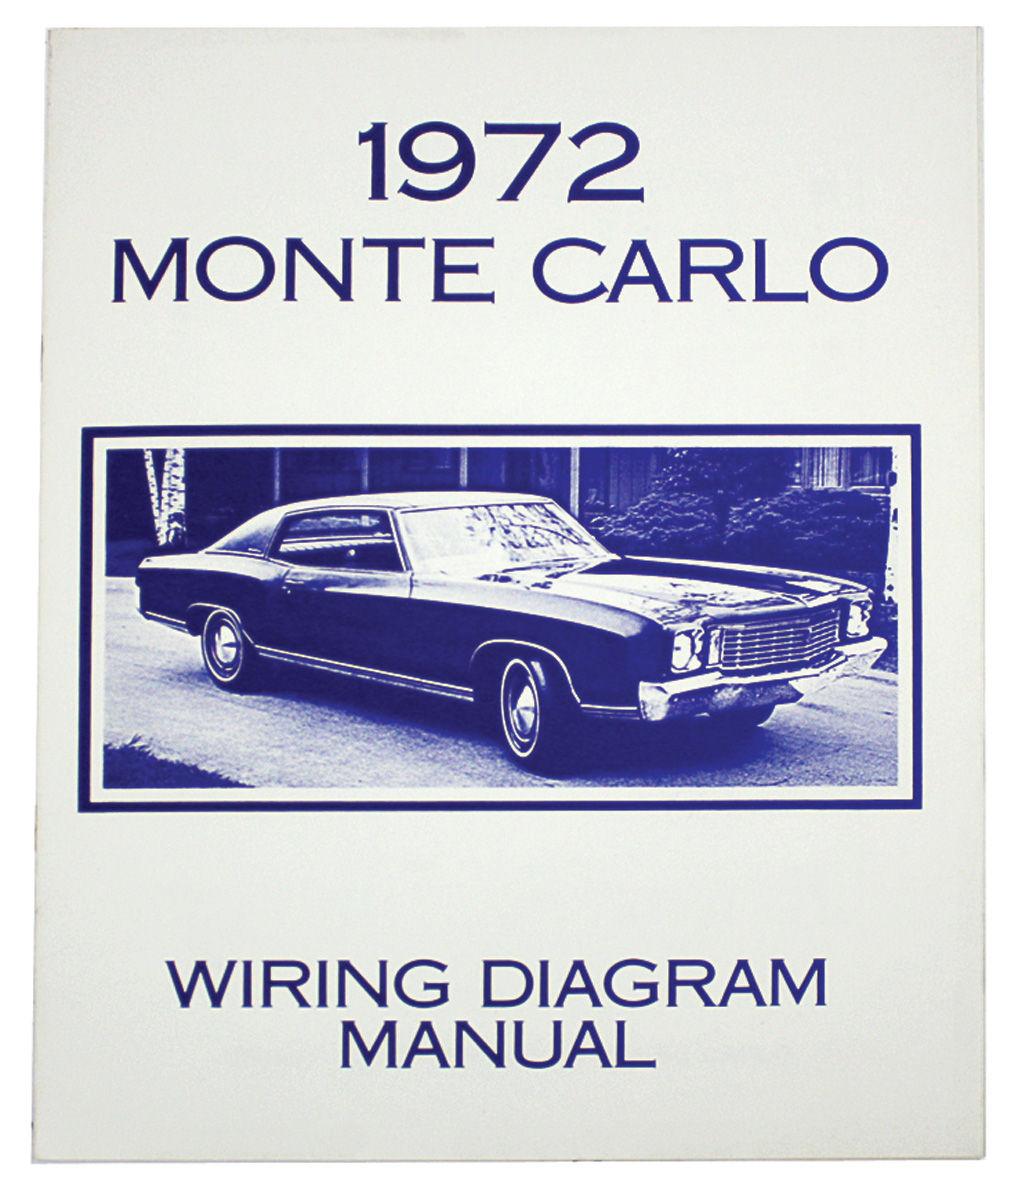 1972 Monte Carlo Fuse Box Diagram Detailed Schematics 1971 Wiring Manuals Opgi Com 1969